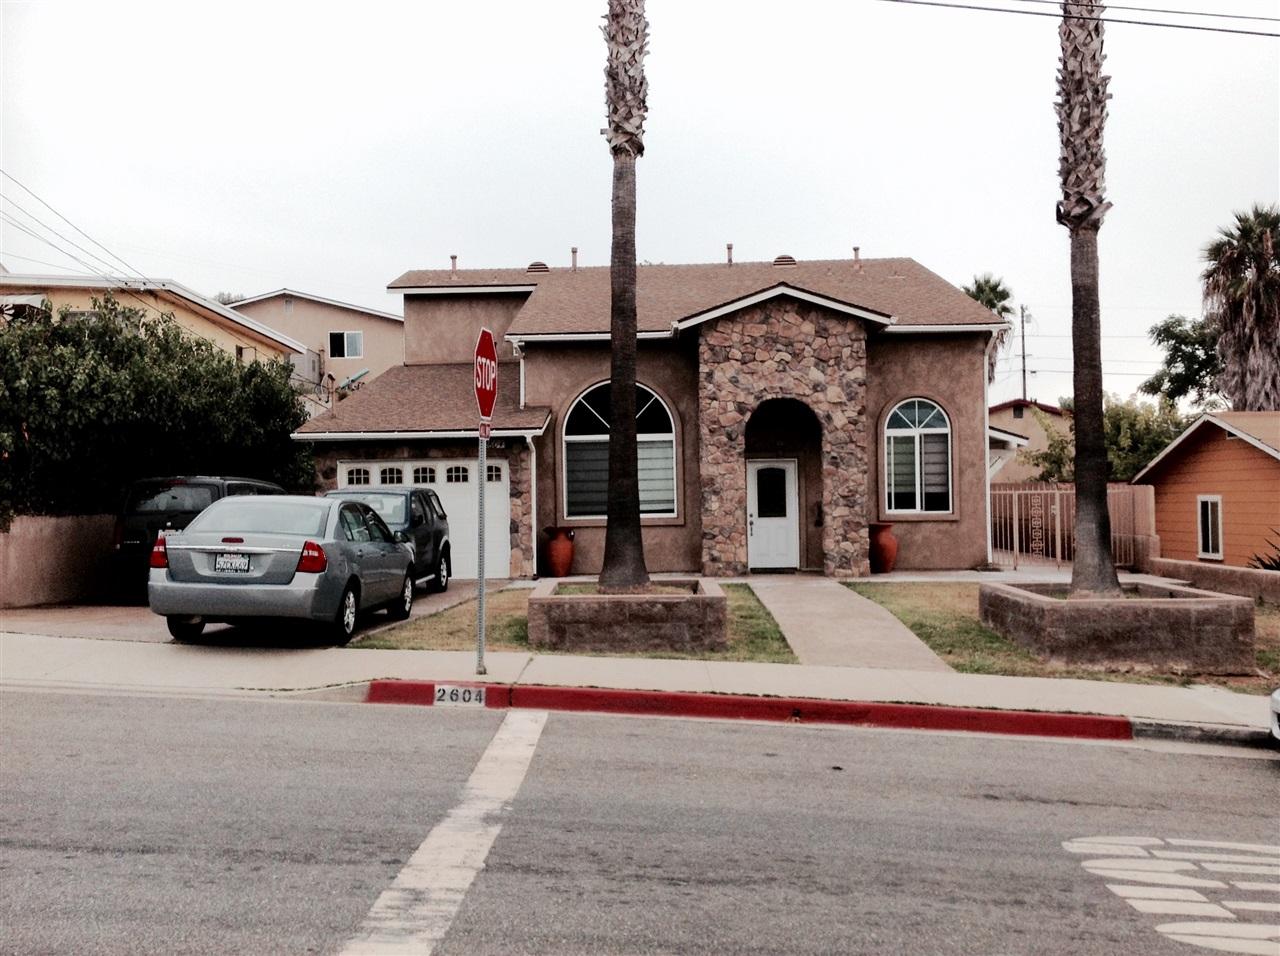 2604 E 24th St, National City, CA 91950